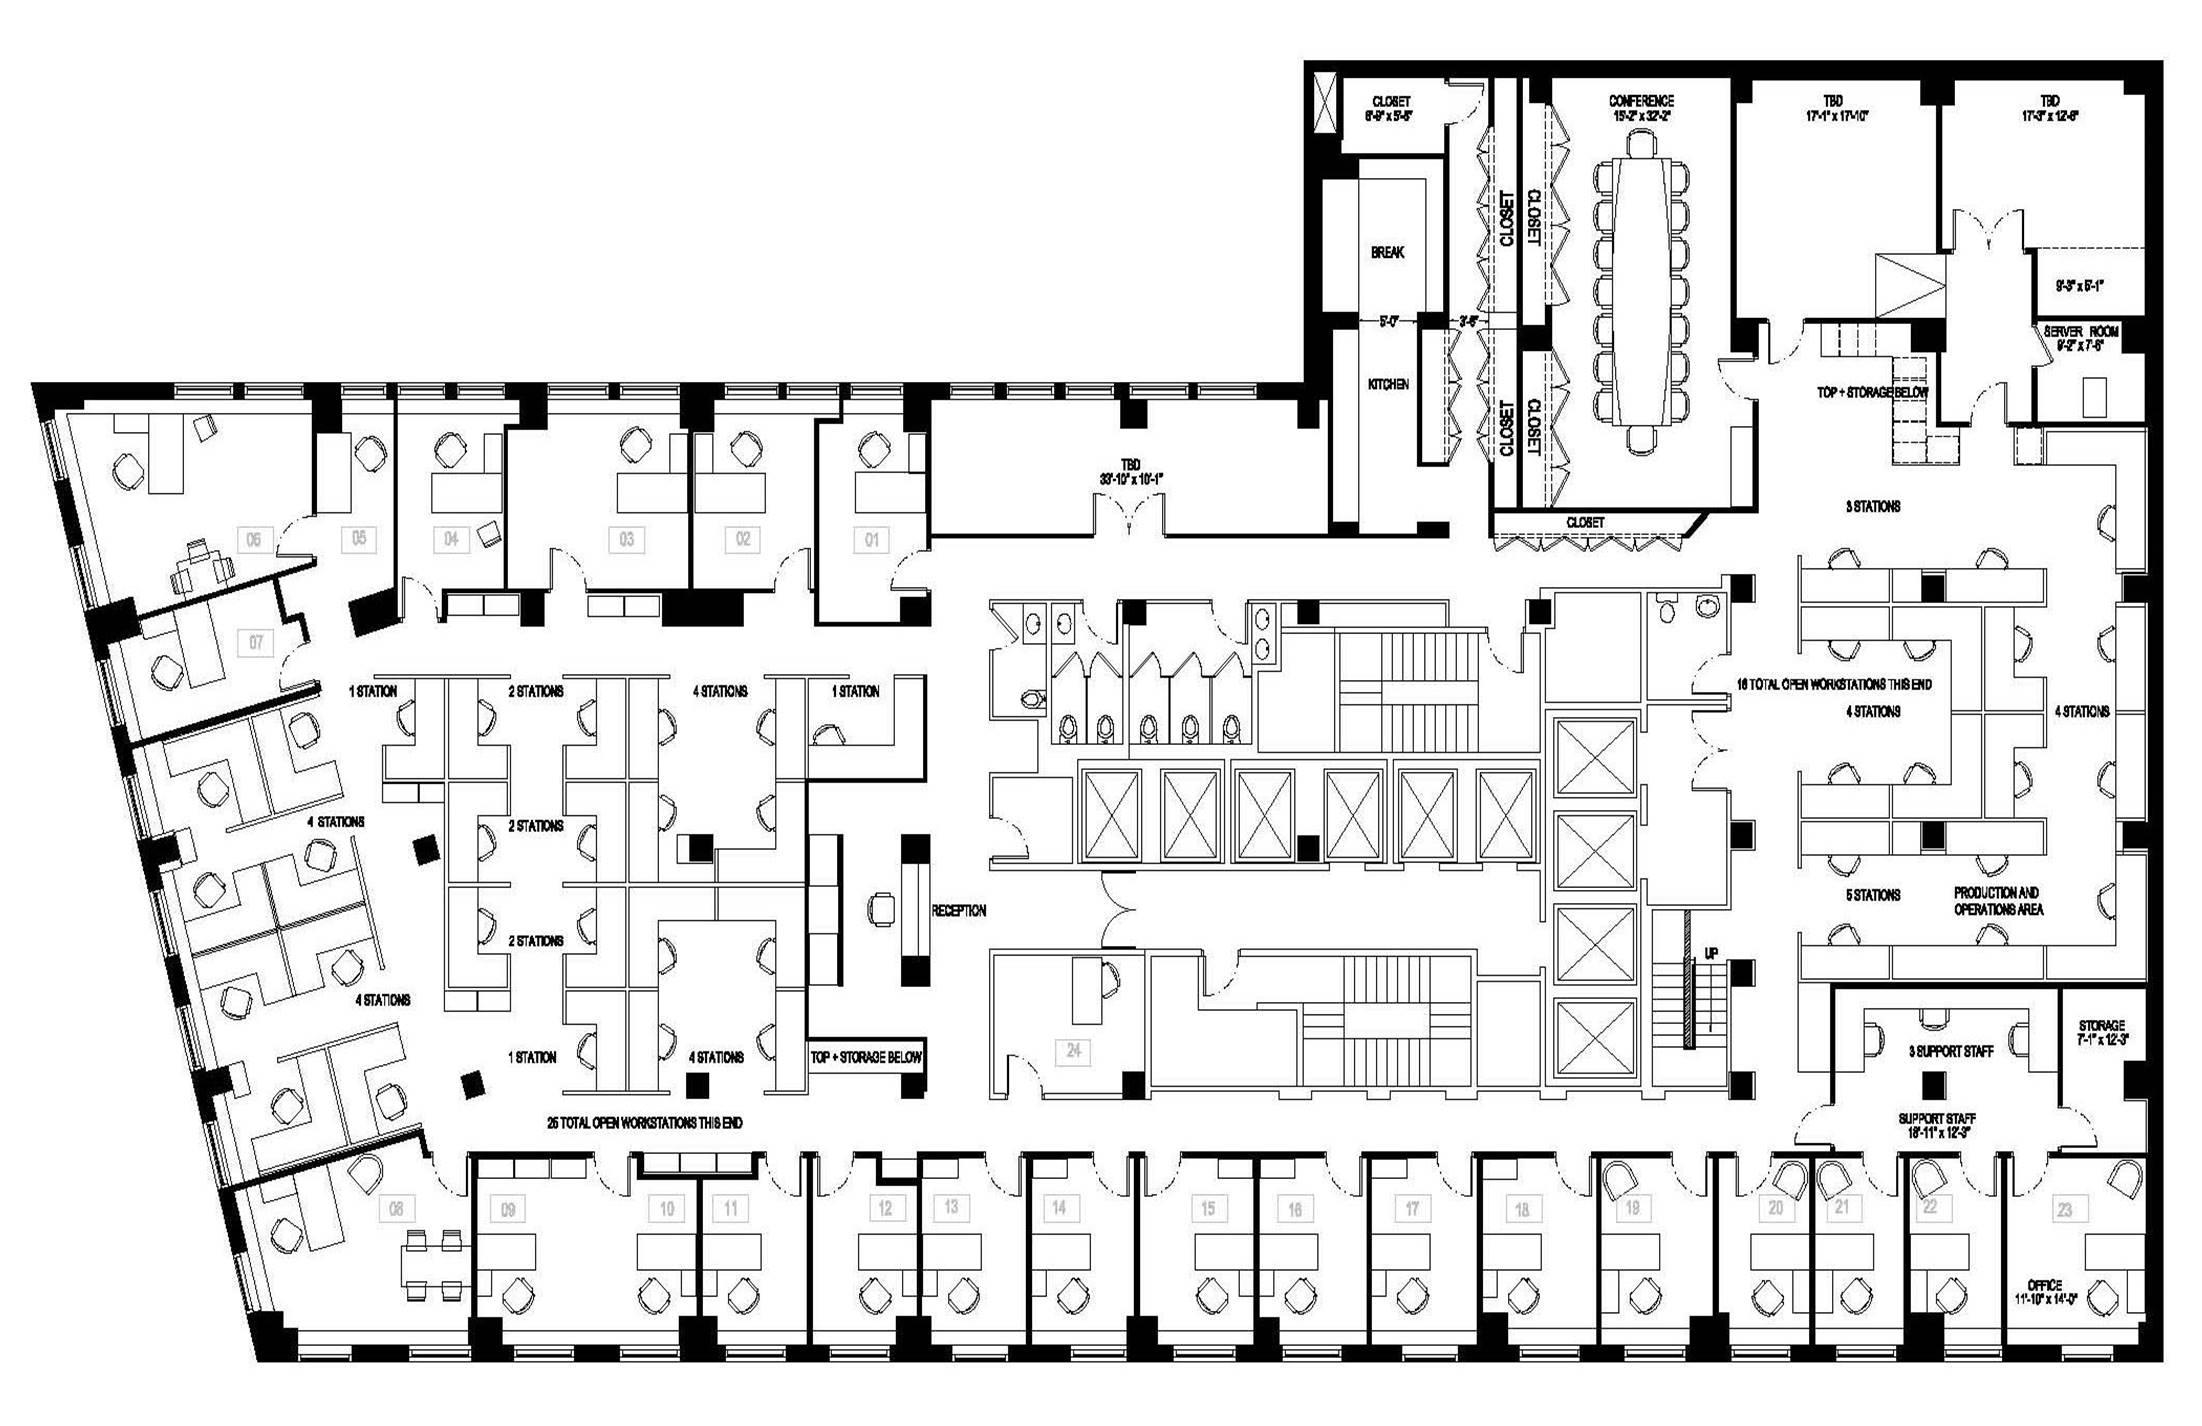 Office Floor Plan Layouts — basecampZERO